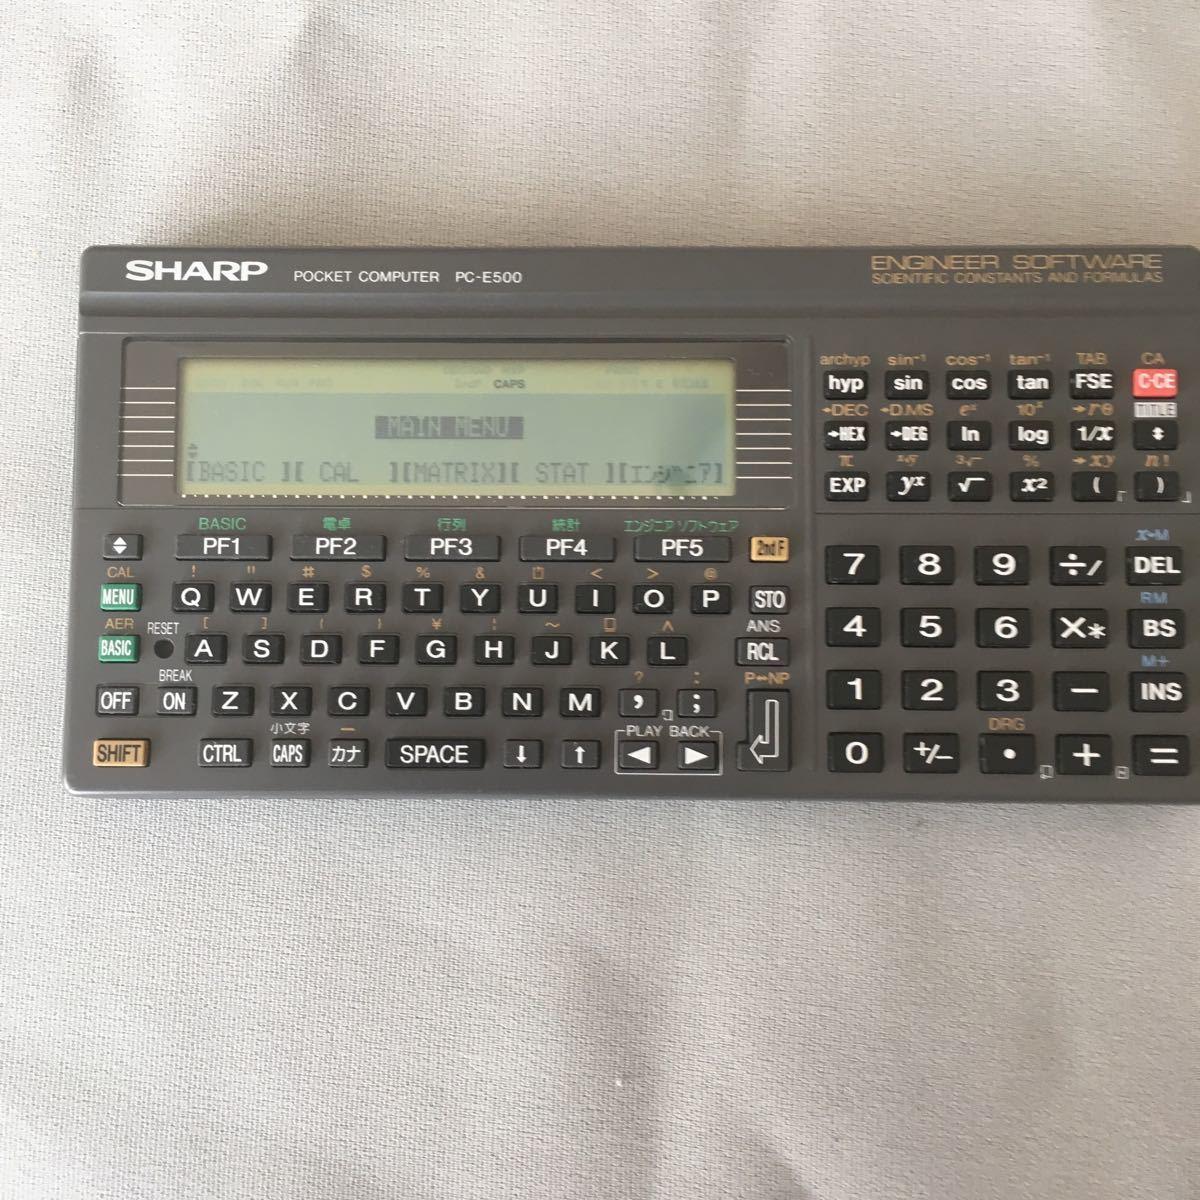 SHARP PC-E500